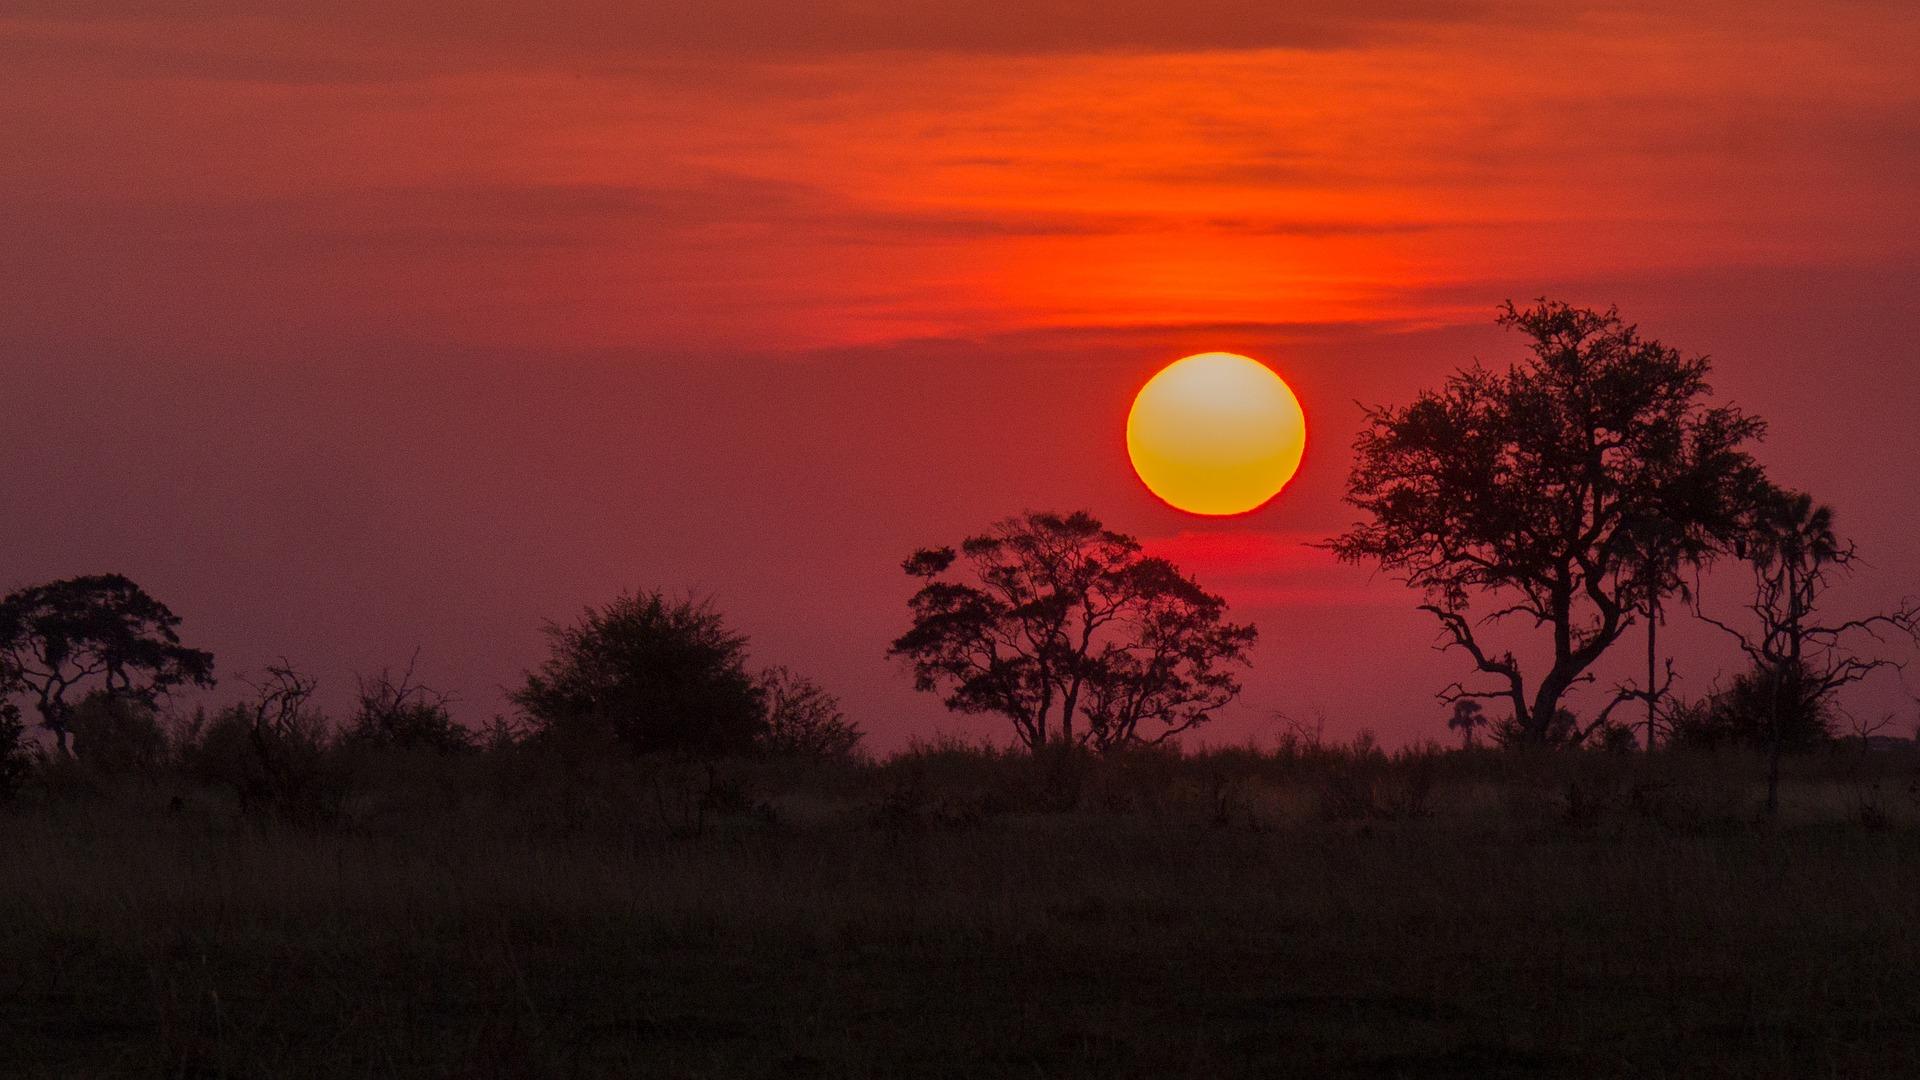 Botswana_coucher_de_soleil_CC0.jpg?1545666742